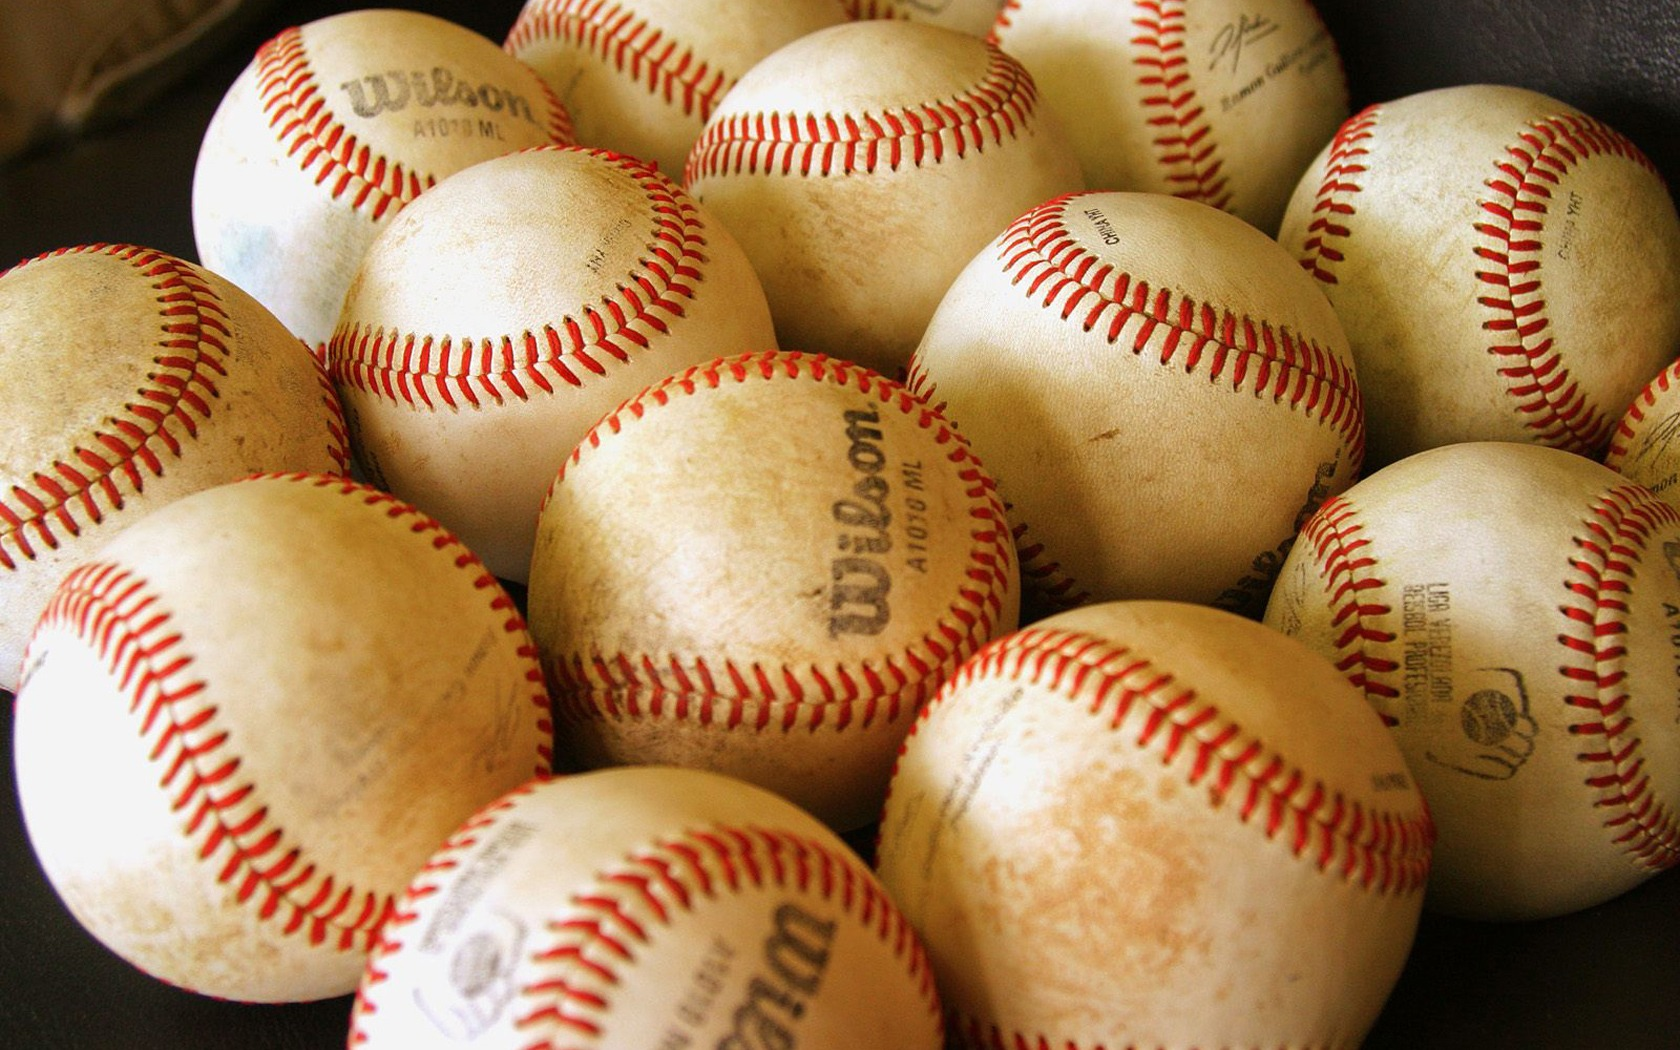 baseball desktop backgrounds baseball desktop backgrounds 1680x1050